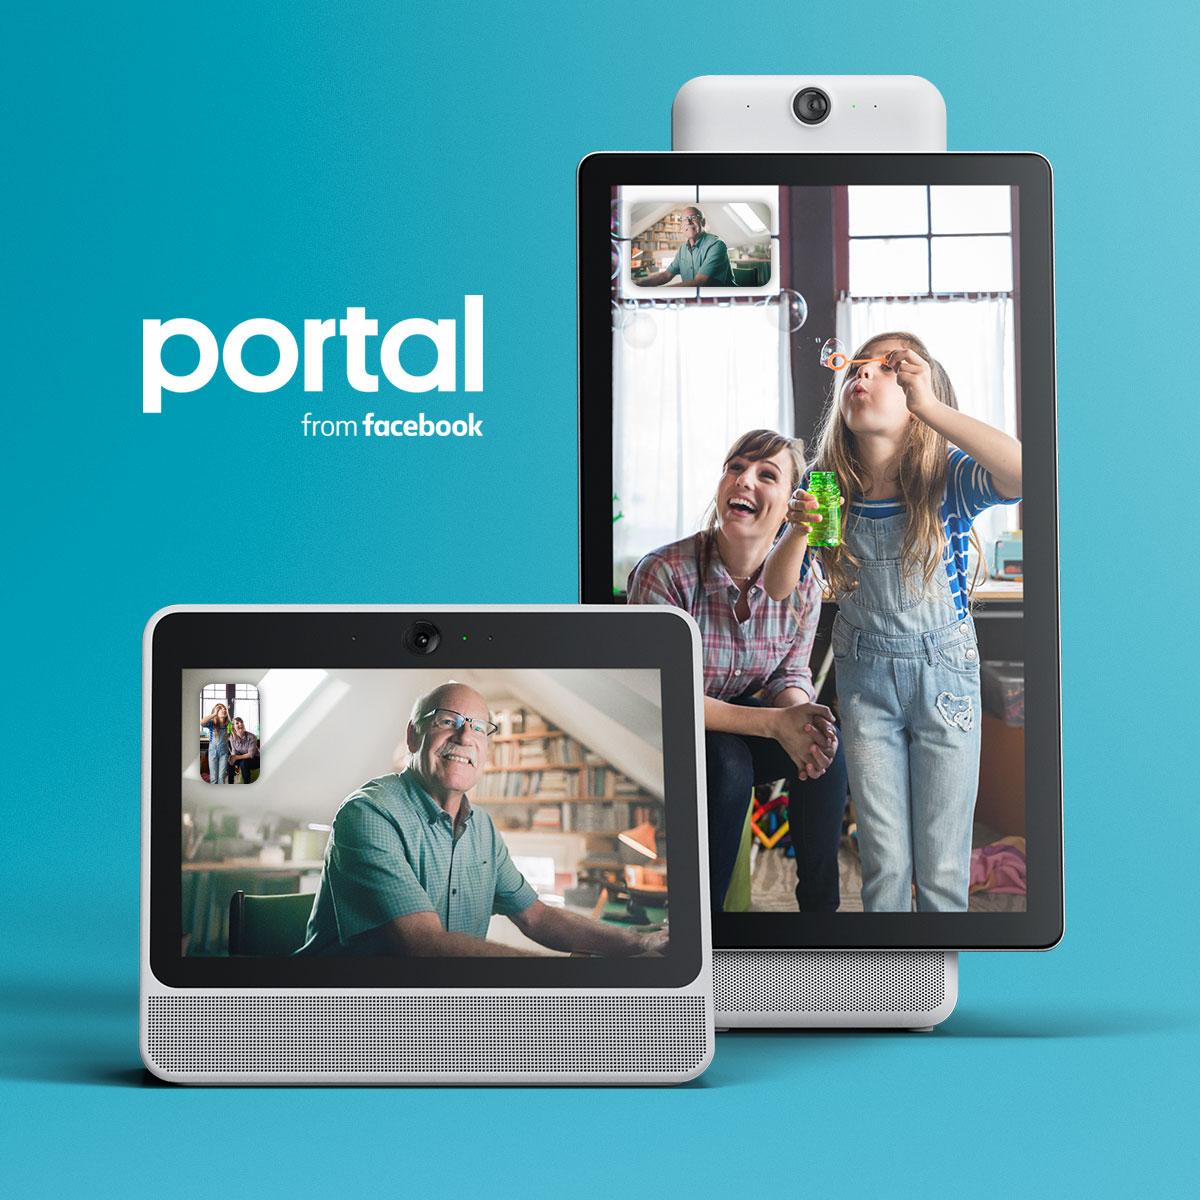 Portal from Facebook